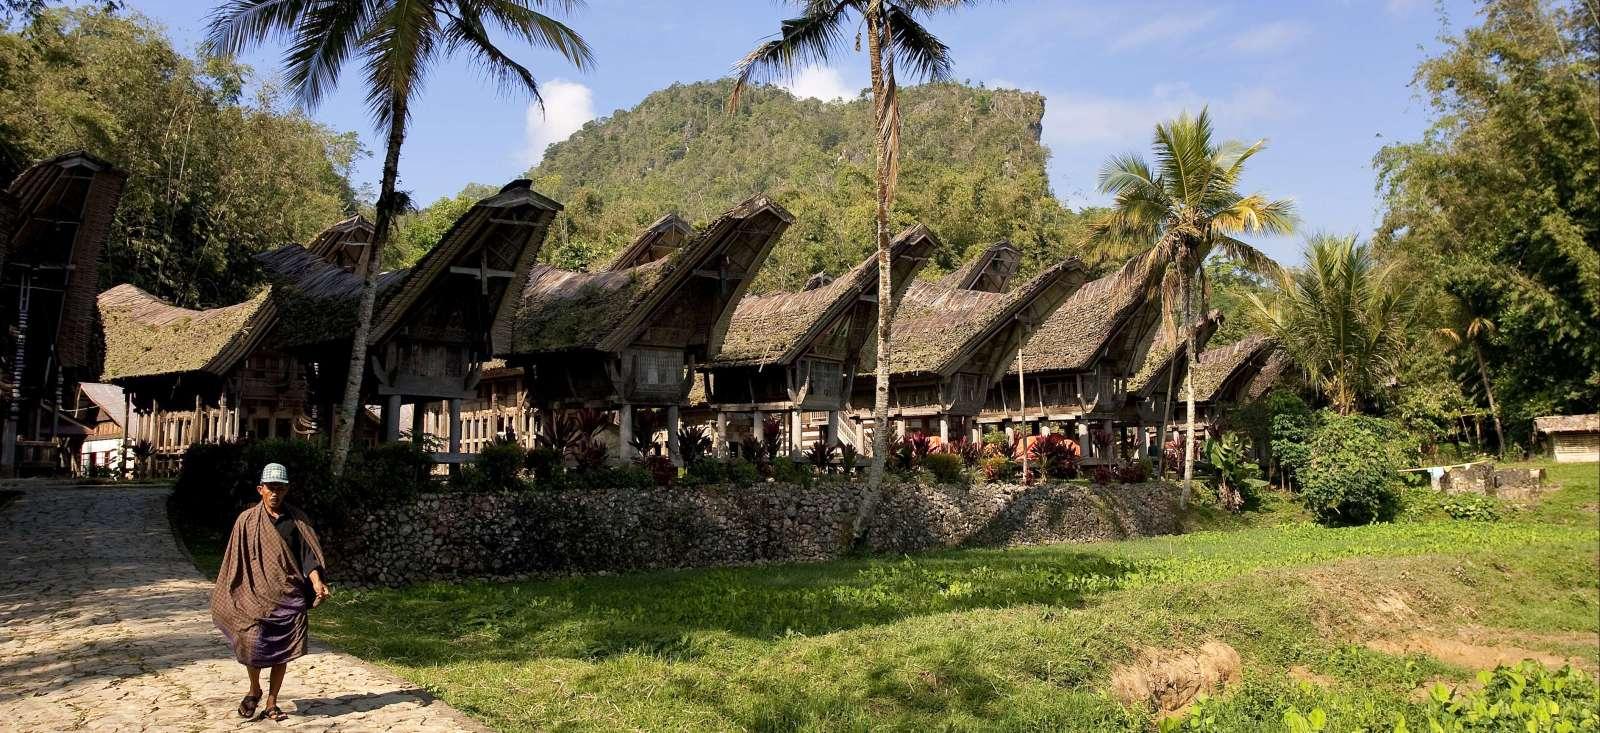 Voyage à pied Indonésie : Selamat pagi Sulawesi!